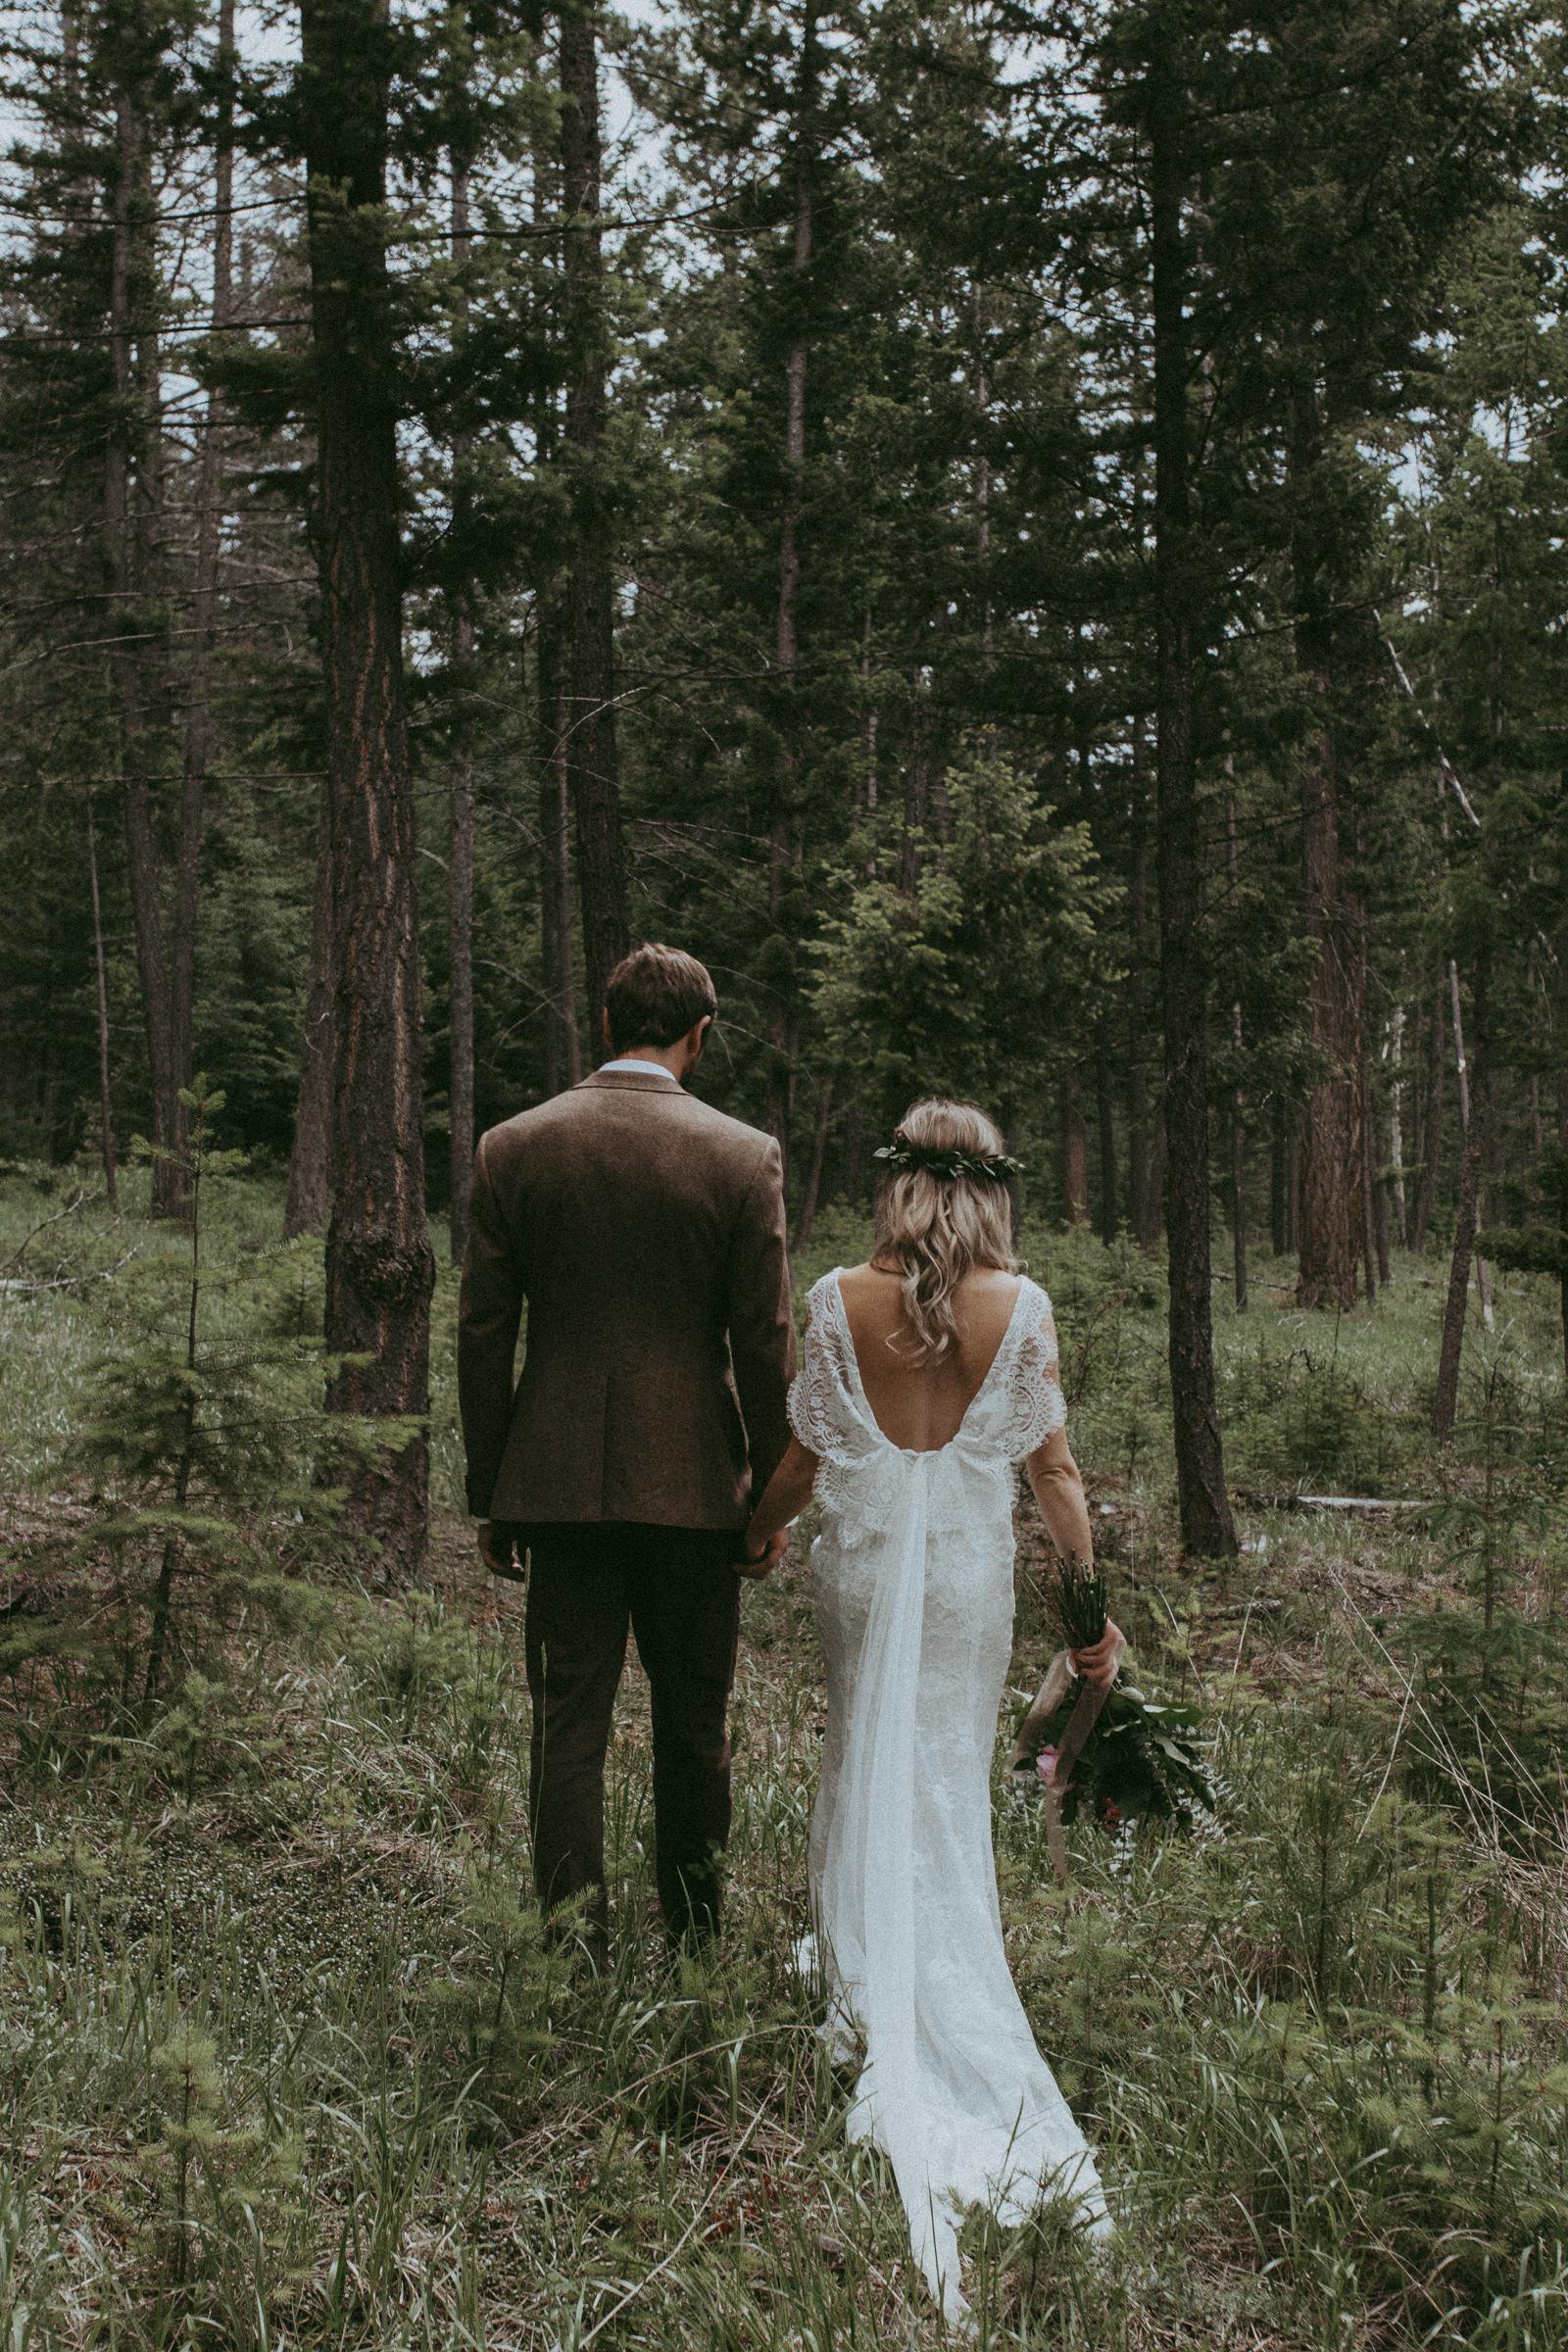 19-06-22 - Rebecca & Aaron - Jasper Wedding - Rocky Mountain Wedding-36.jpg